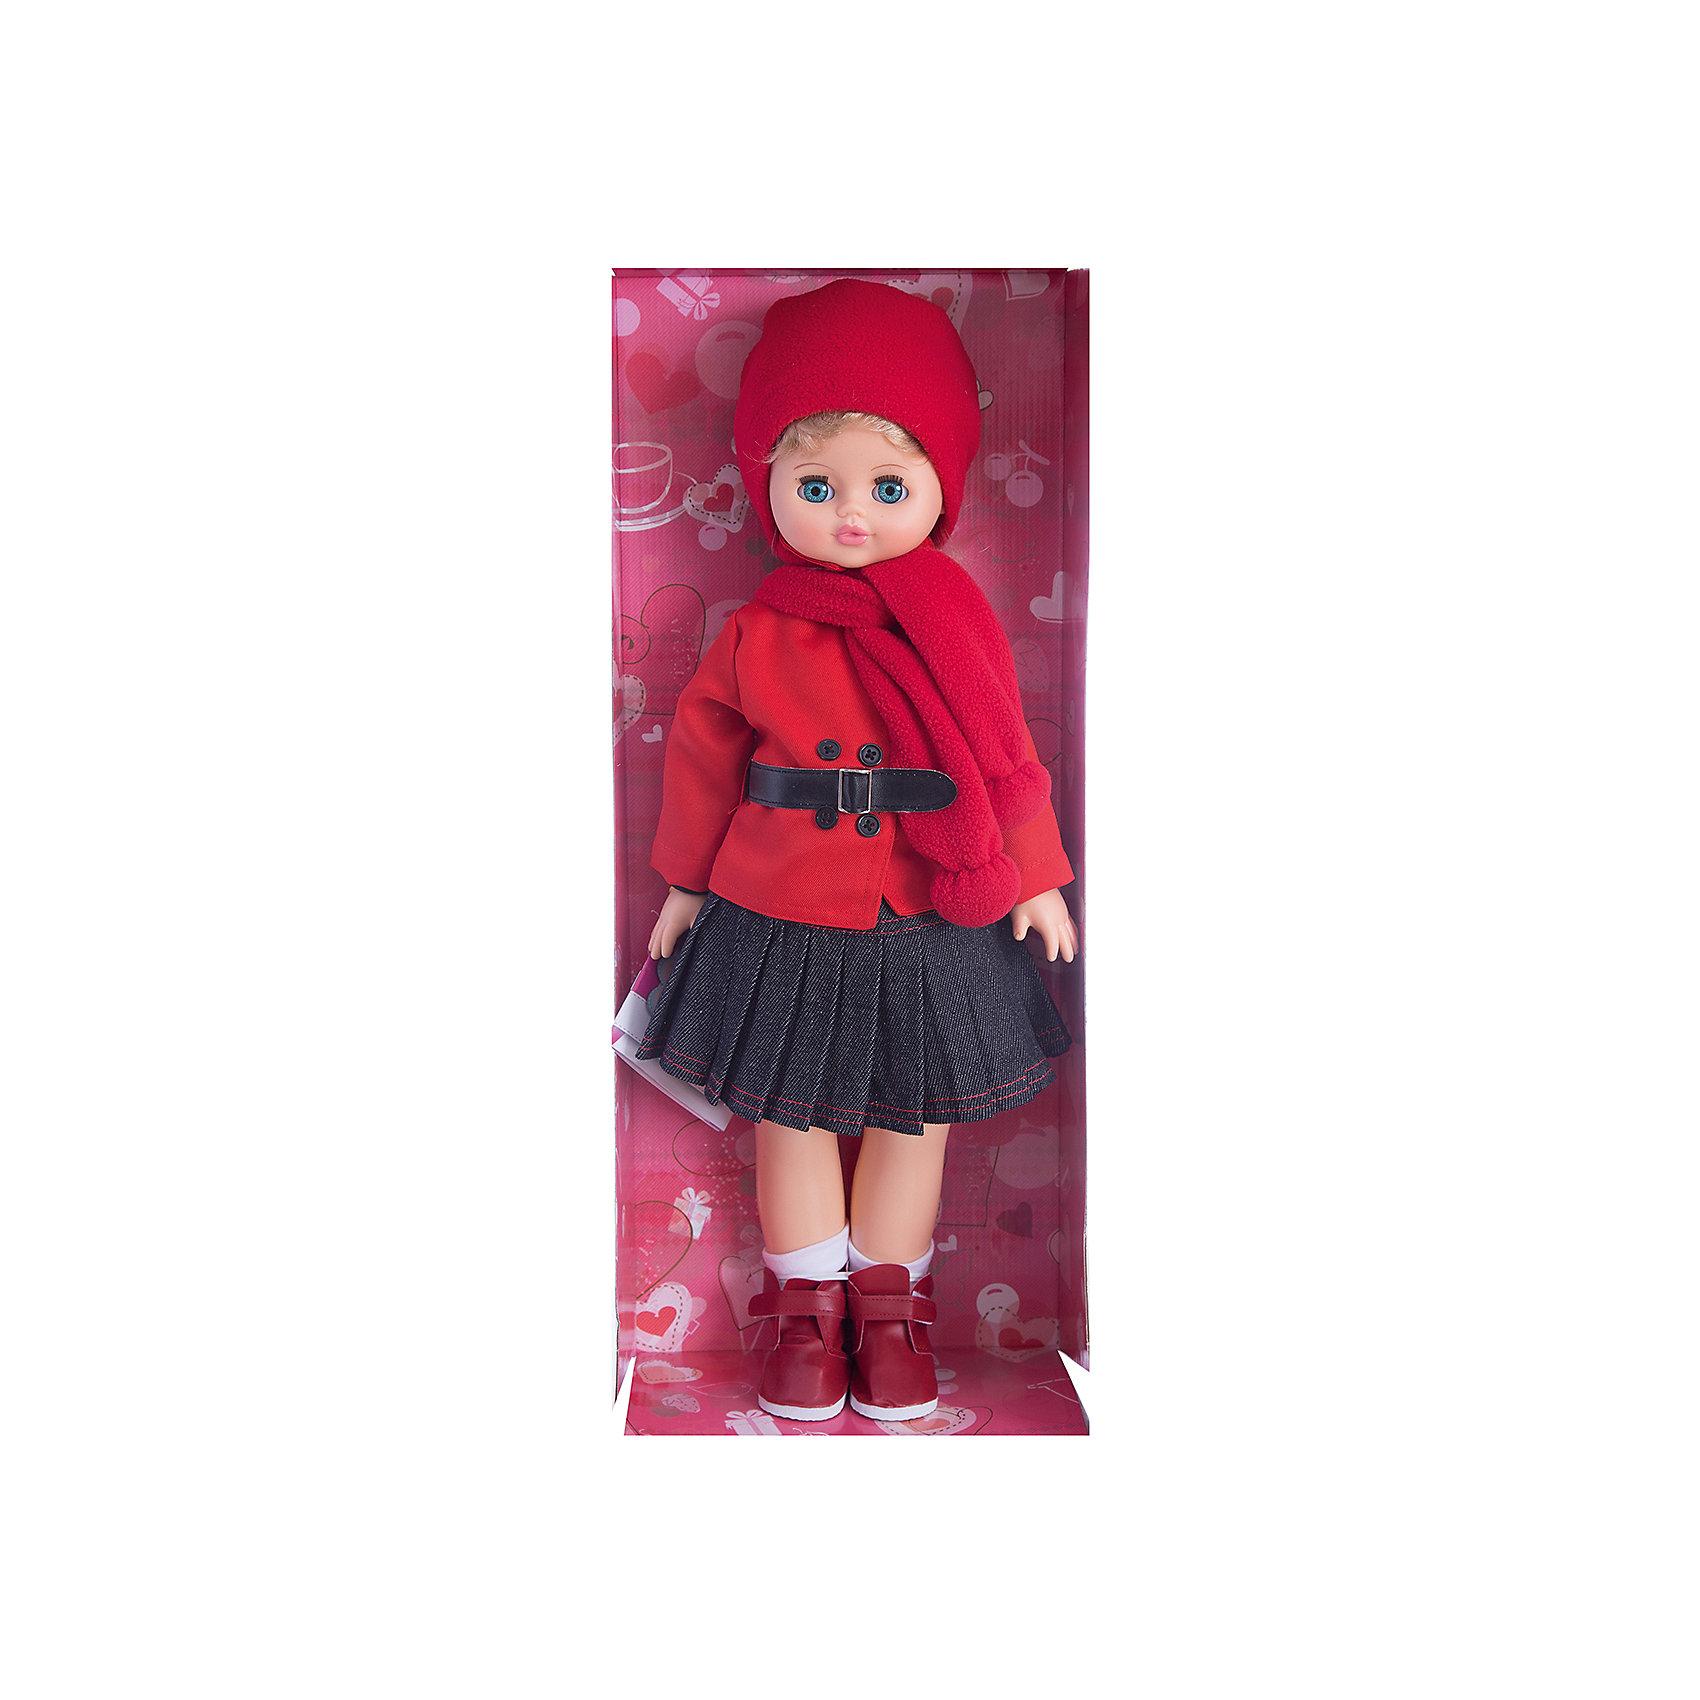 Весна Кукла Алиса 29, со звуком, Весна куклы и одежда для кукол llorens кукла алиса 33 см со звуком